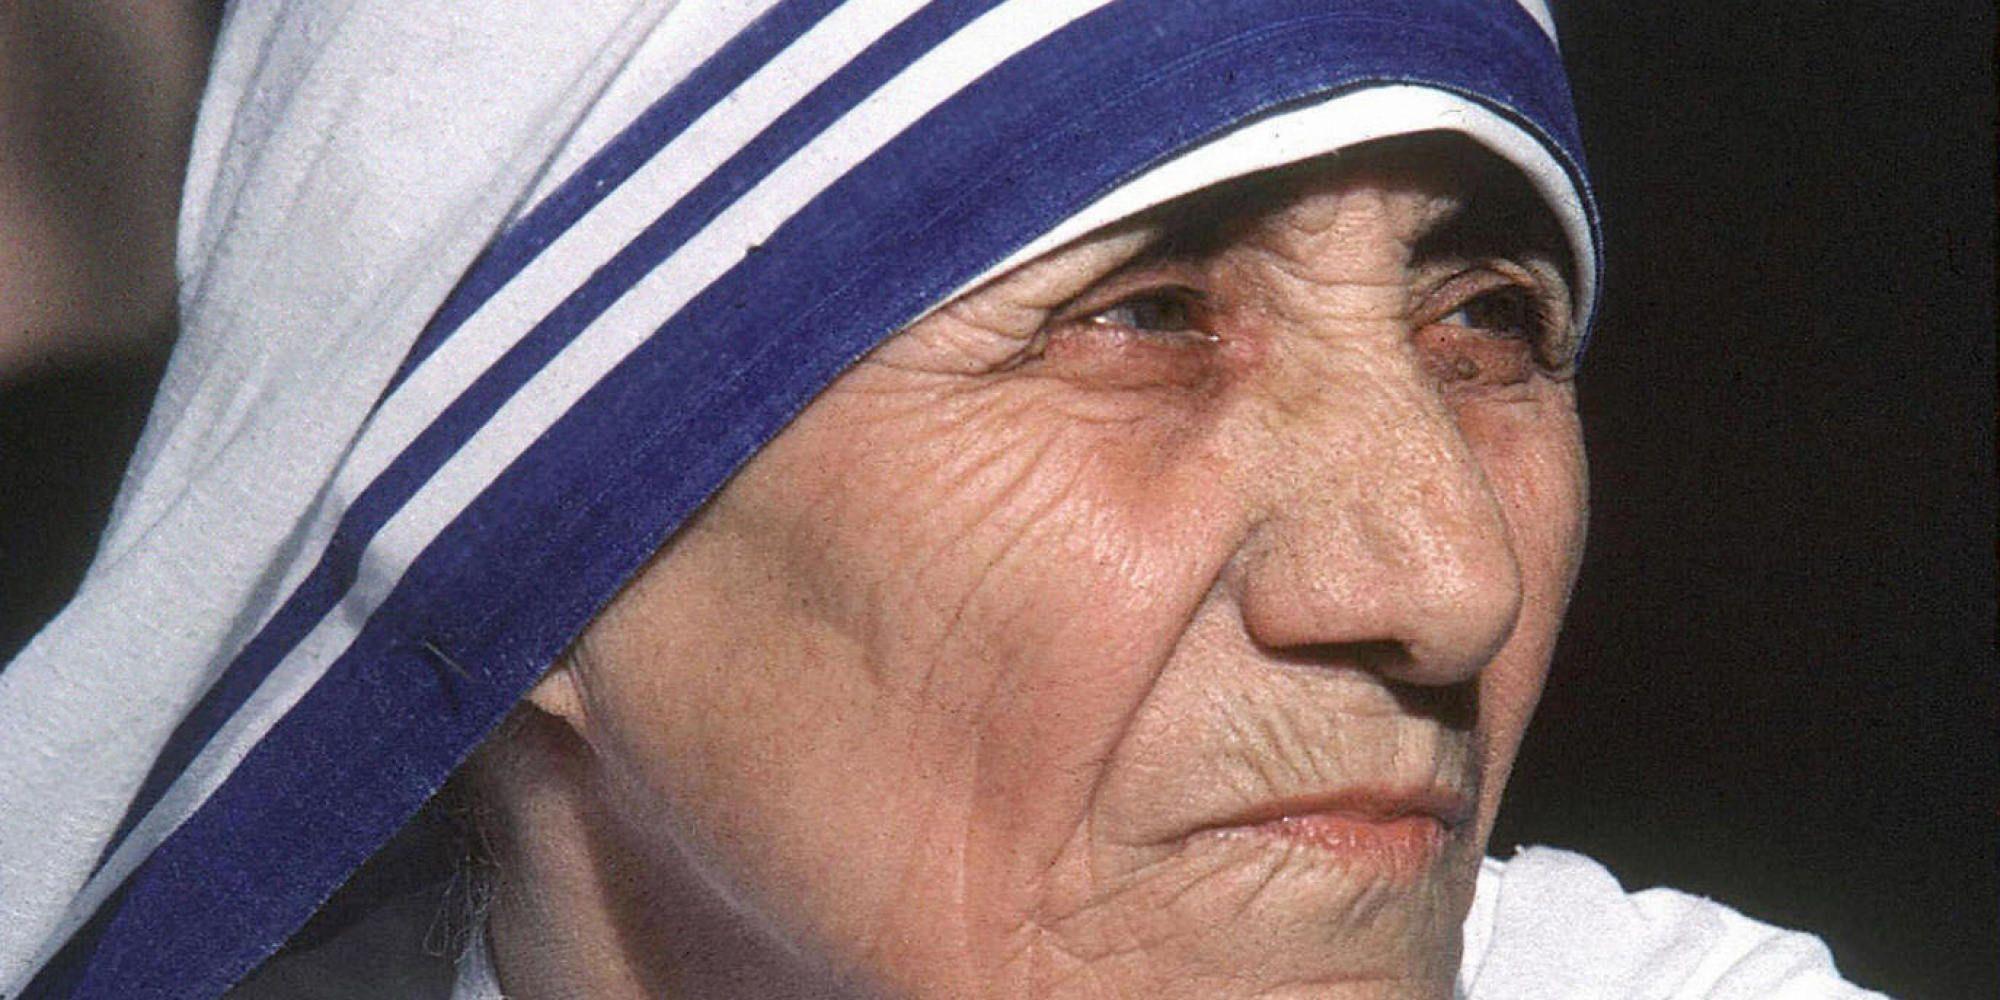 004 Mother Teresa Net Worth Different Mother teresa